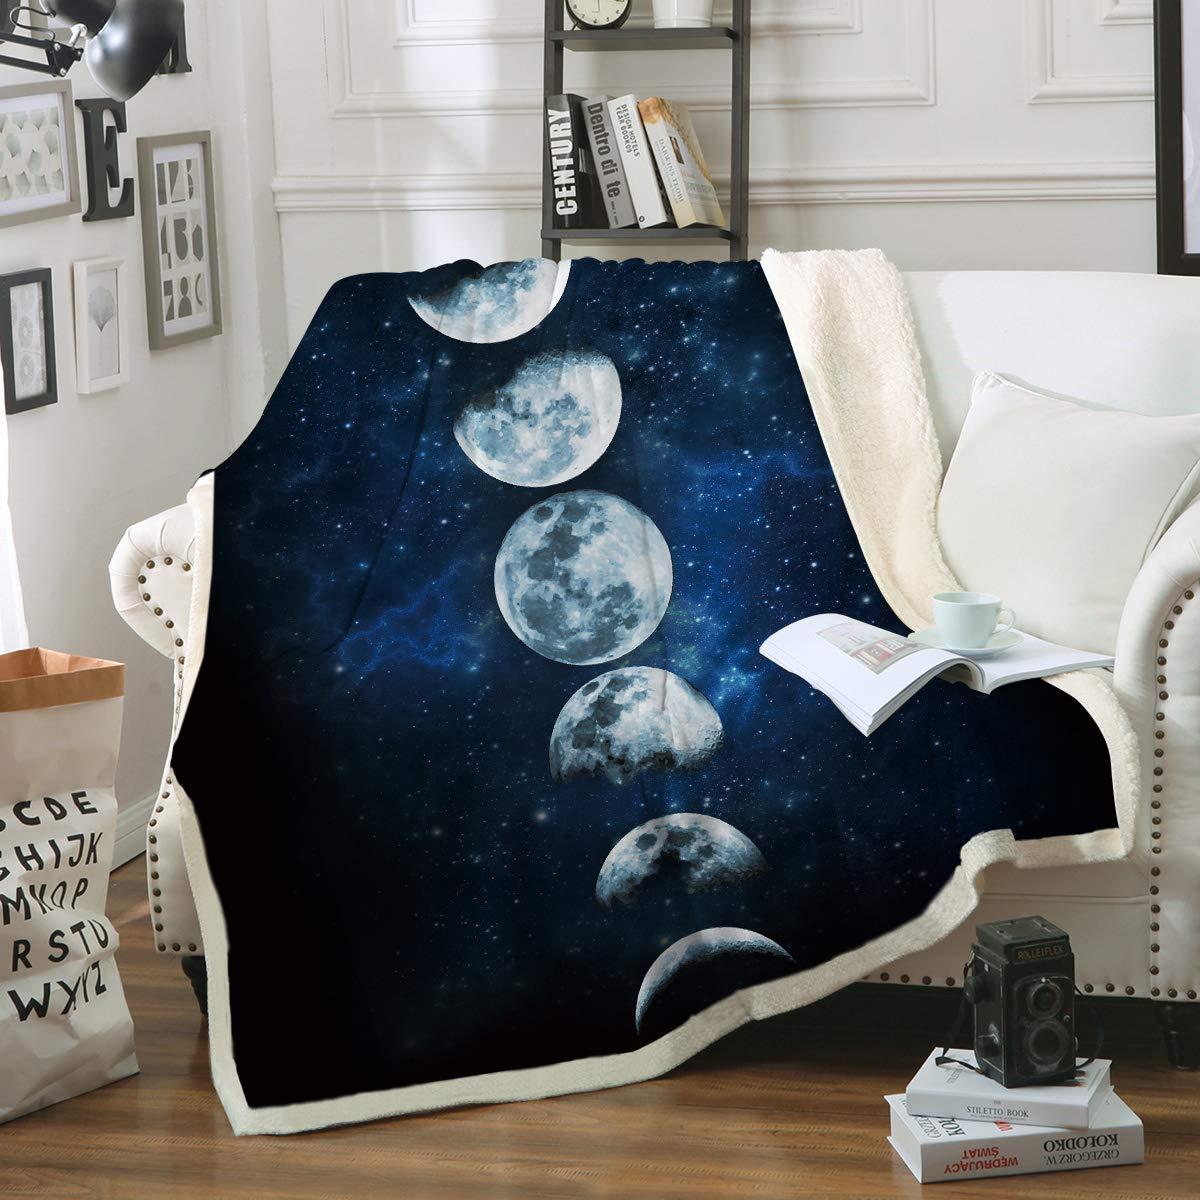 Sleepwish Lunar Eclipse Blanket Moon Phases Blanket Celestial Fleece Blanket Dark Blue Sherpa Throw Blanket College Dorm Blanket (60''x 80'')